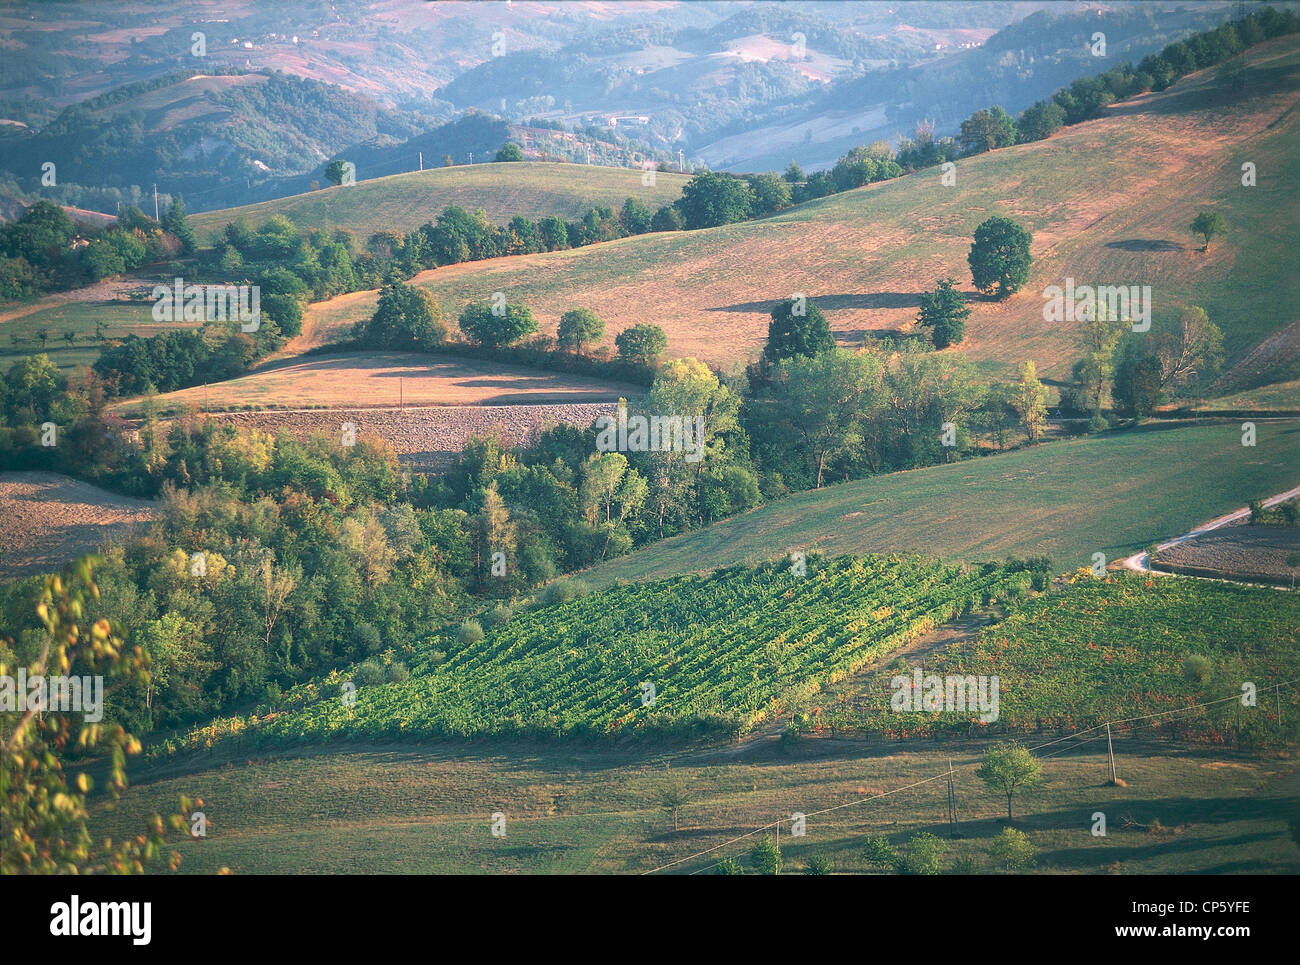 Emilia Romagna - Vineyards in Castel San Pietro Terme and Sassoleone. Stock Photo